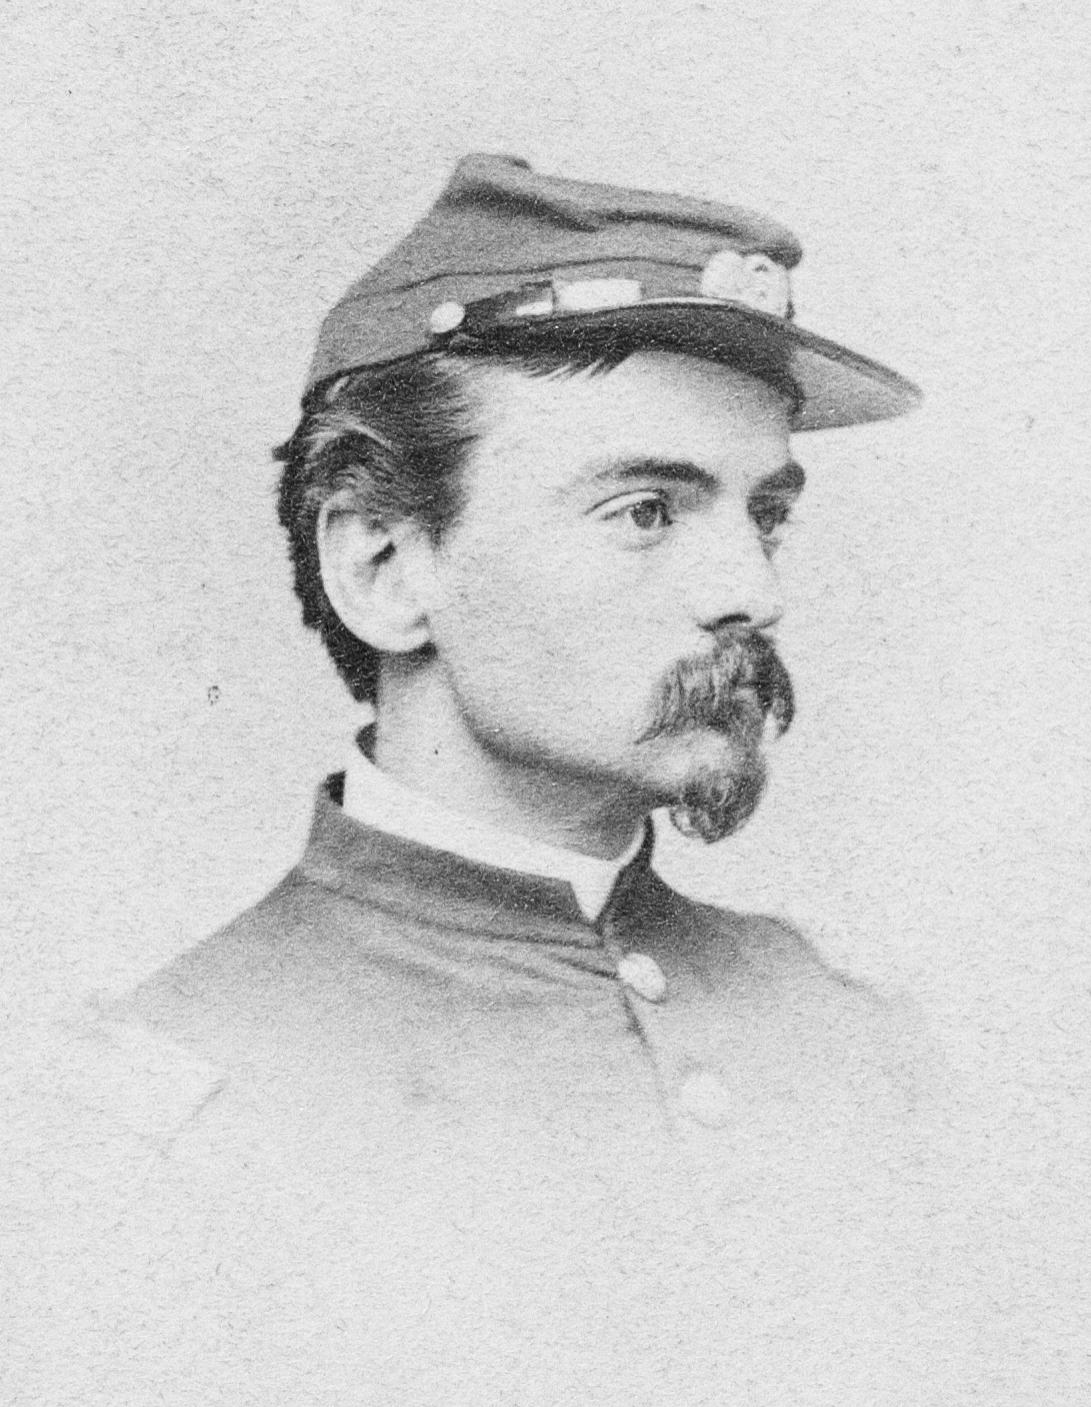 Capt. William White Dorr, daguerreotype. Courtesy of Charles Edward Dorr. Photo by Caleb Ashton Dorr.